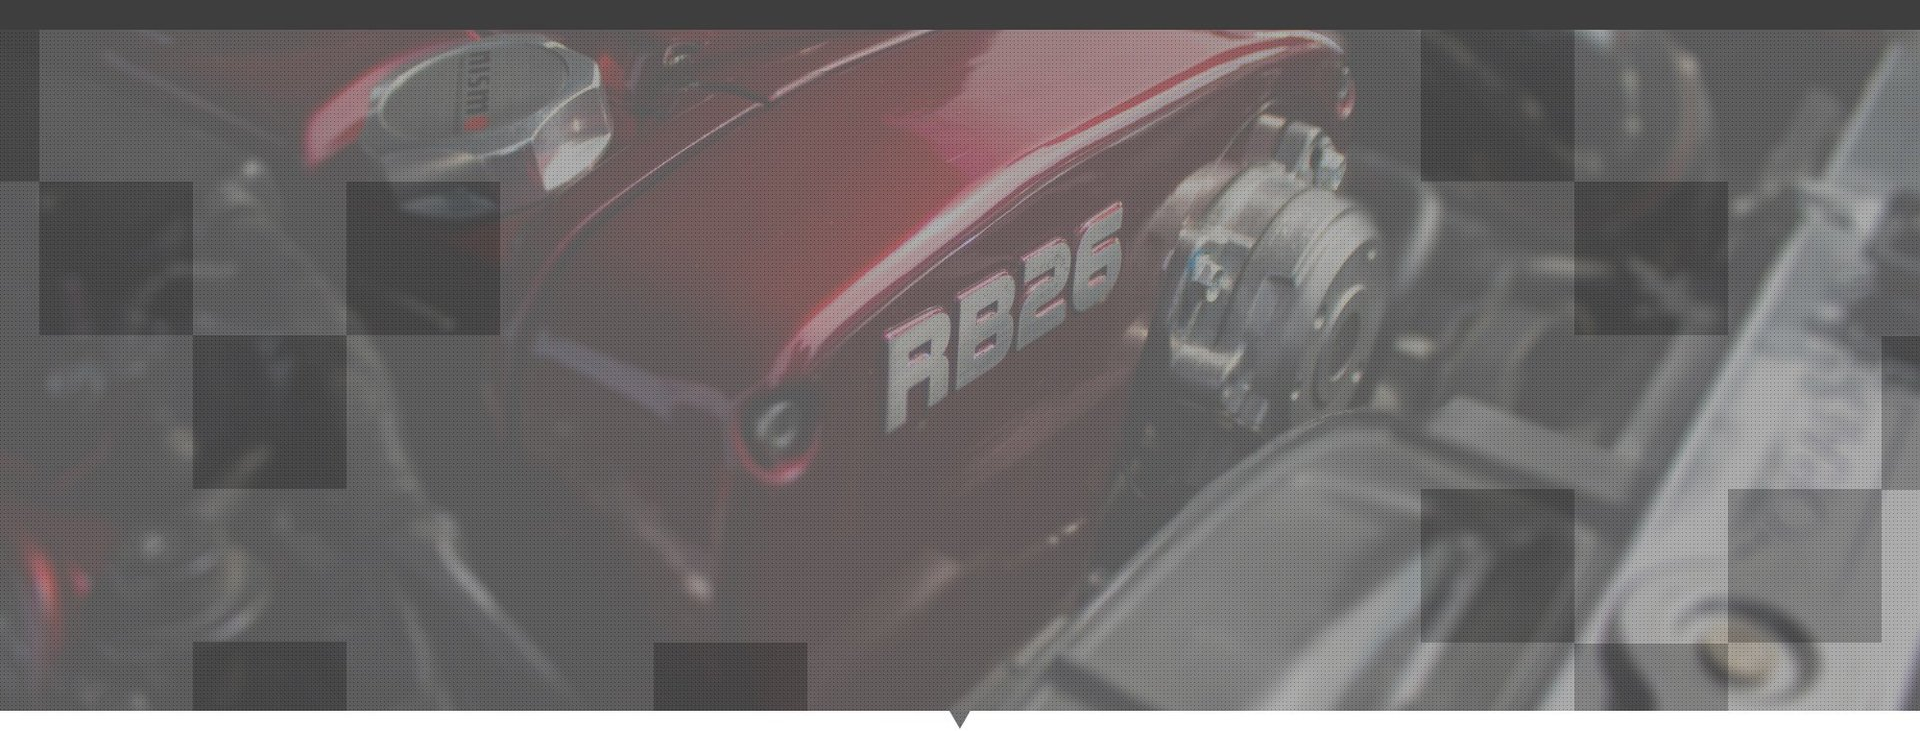 Close up of an engine